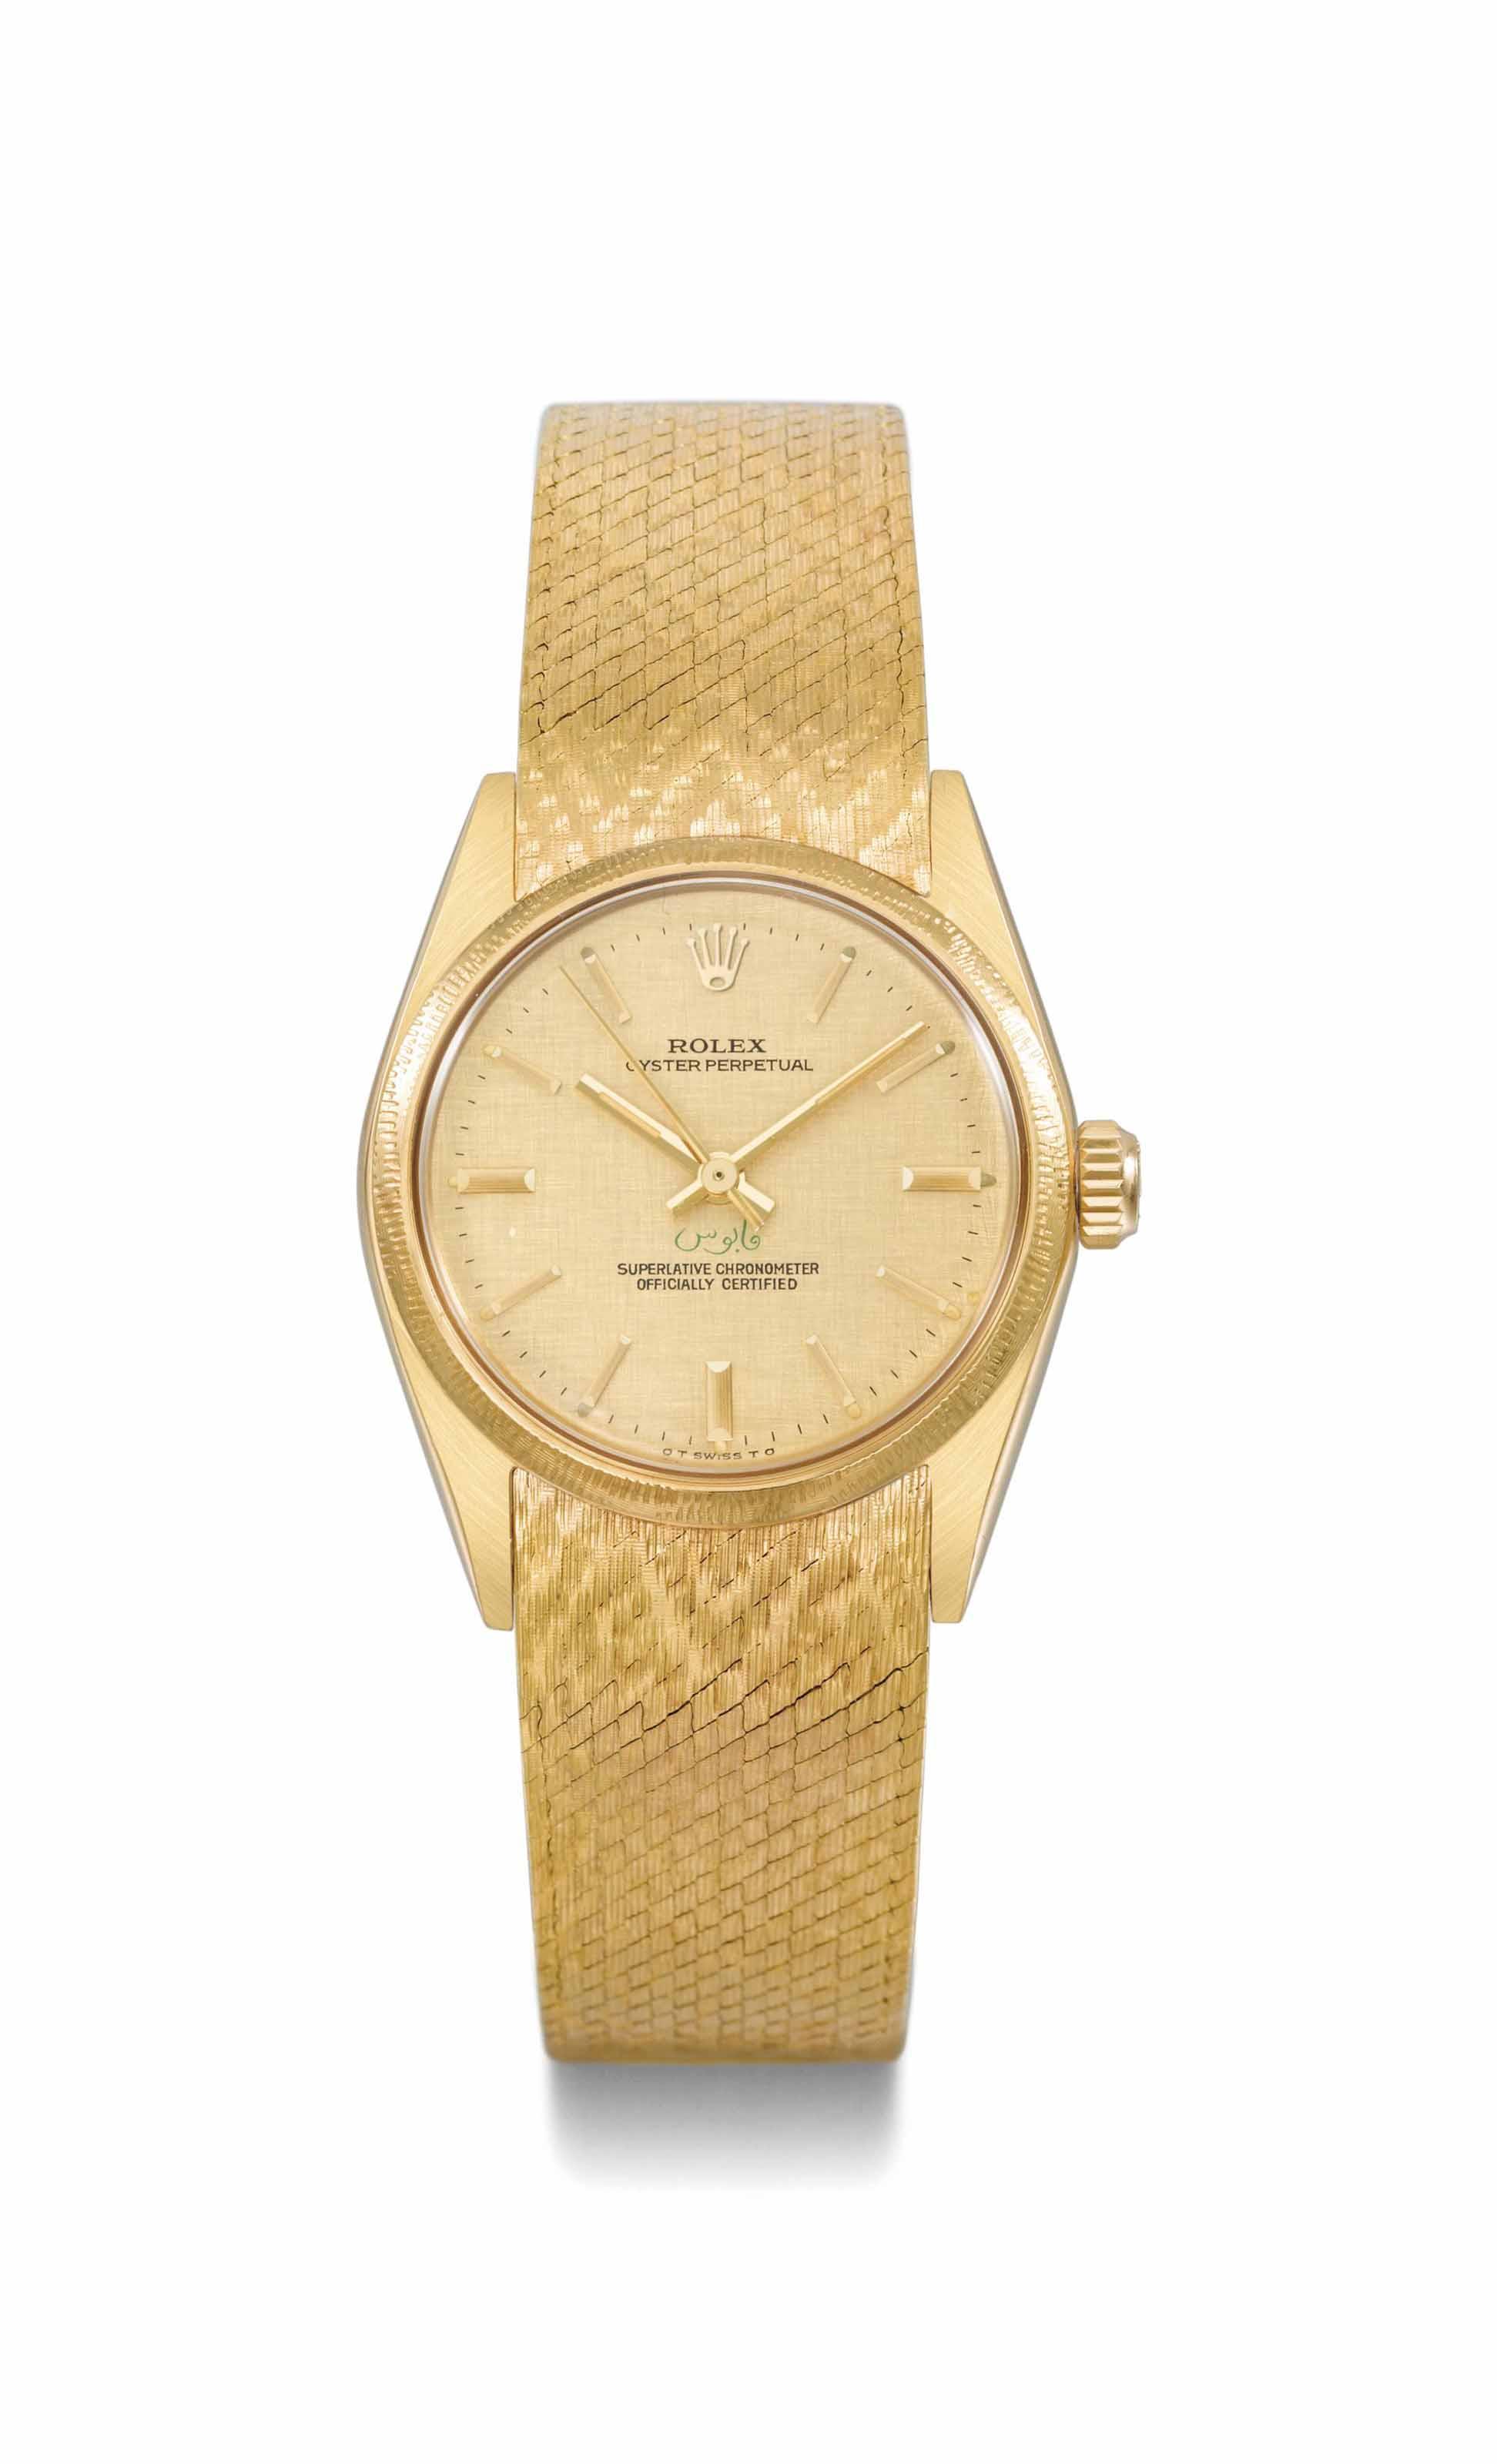 Rolex. A fine, attractive and